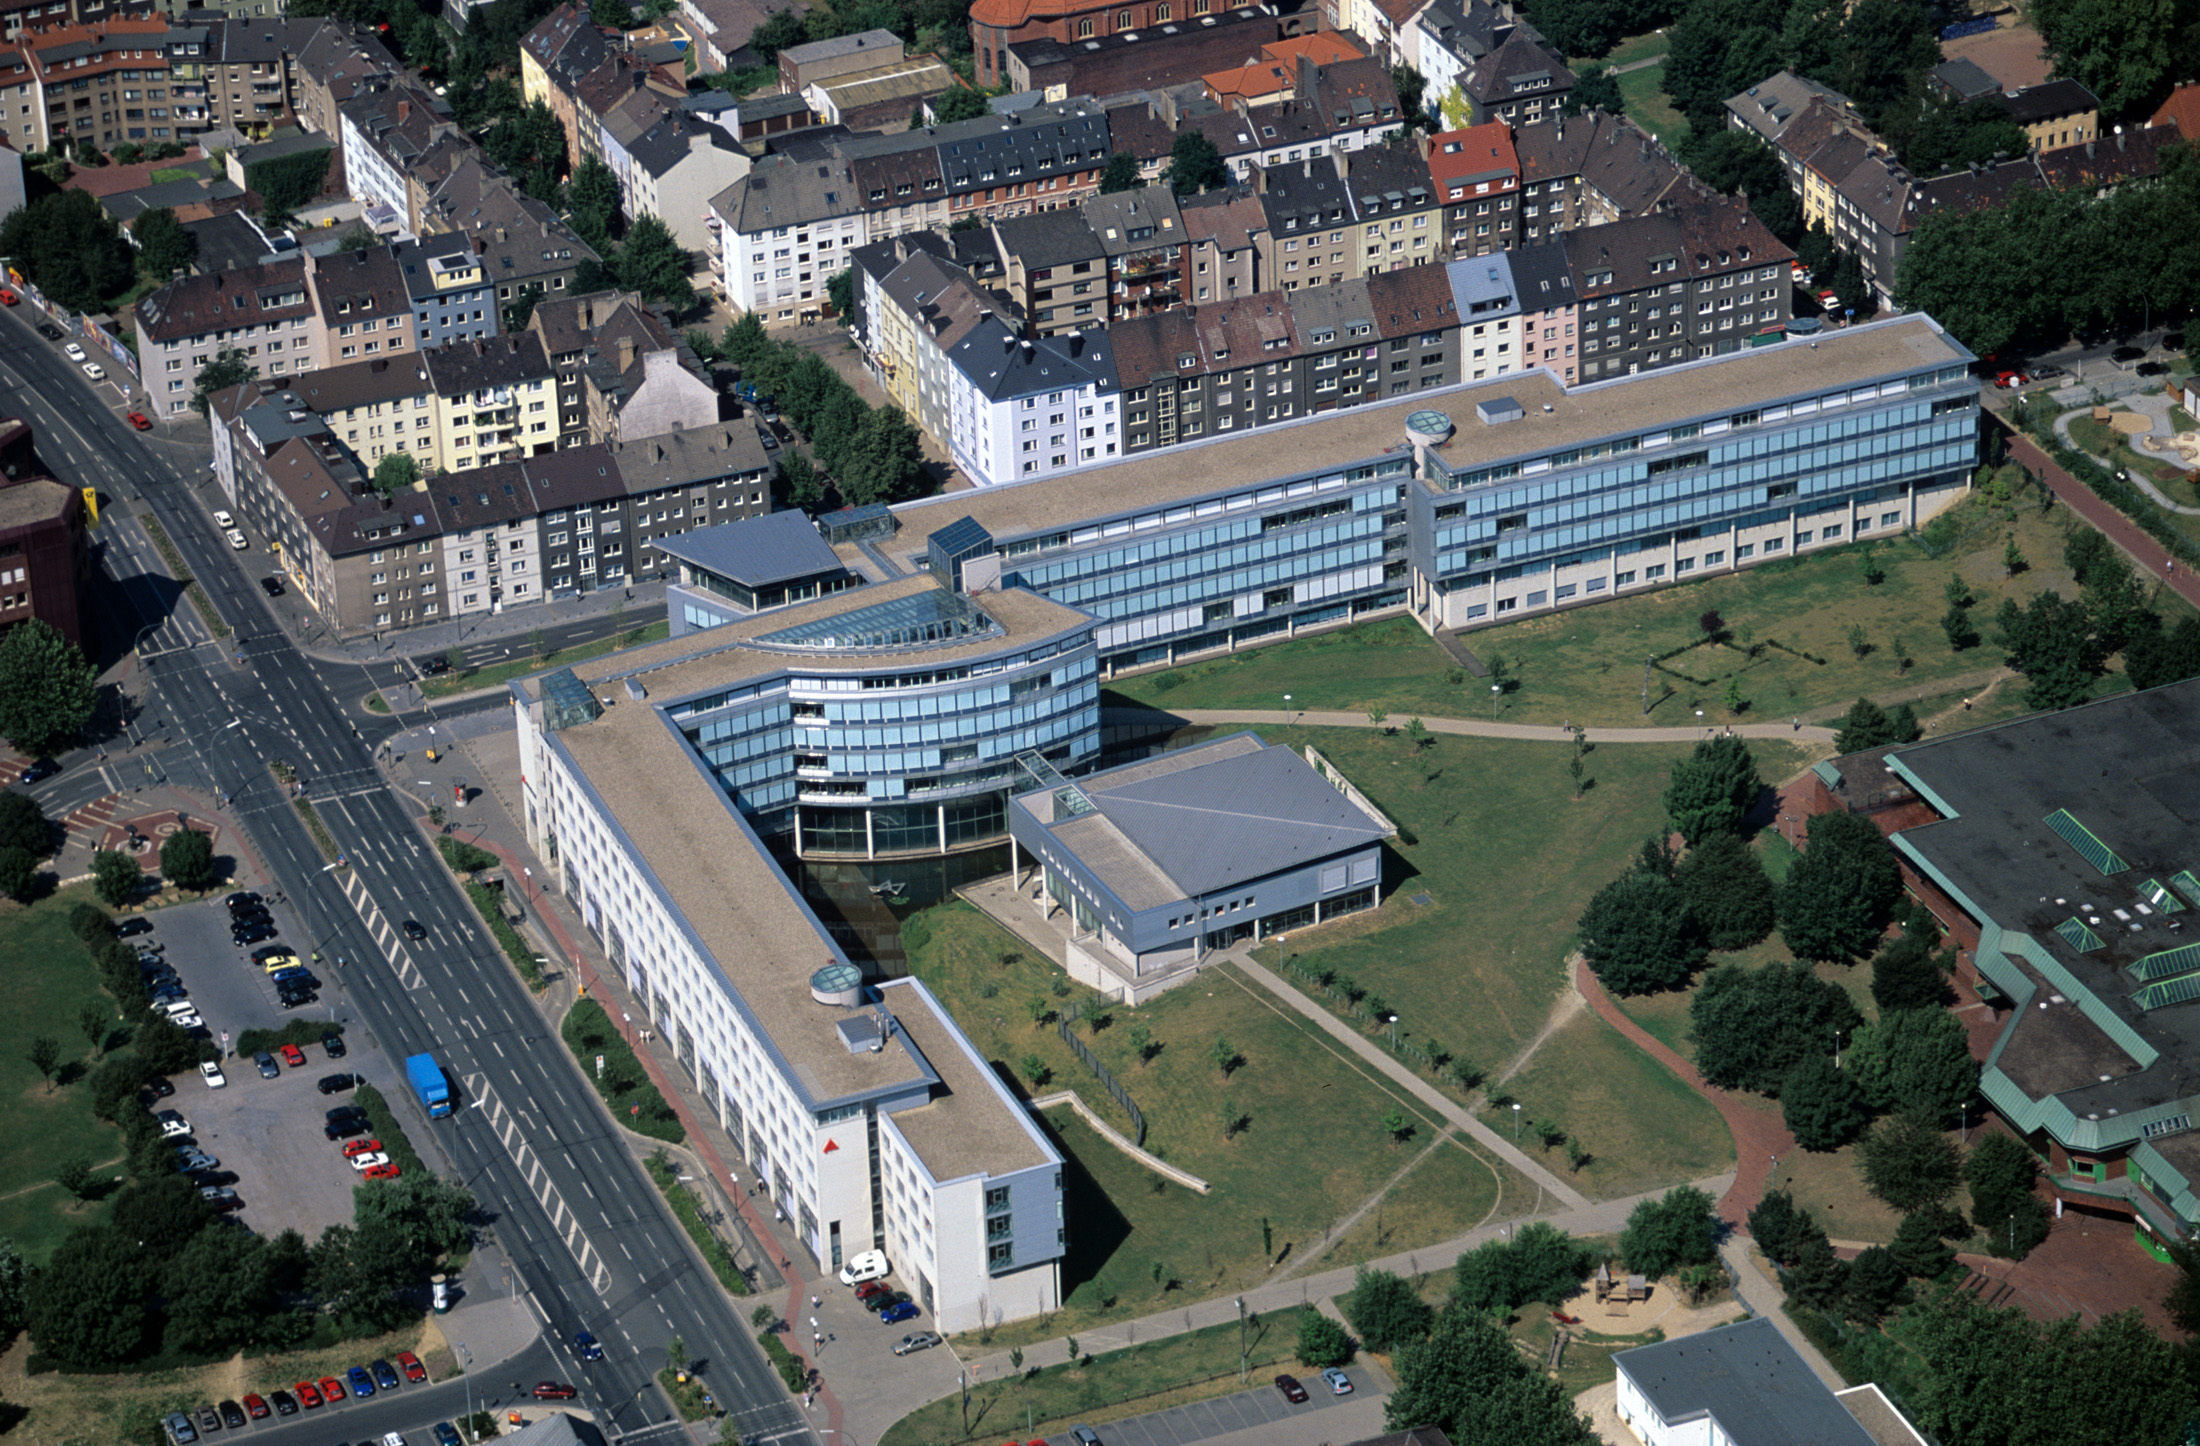 Arbeitsamt Dortmund